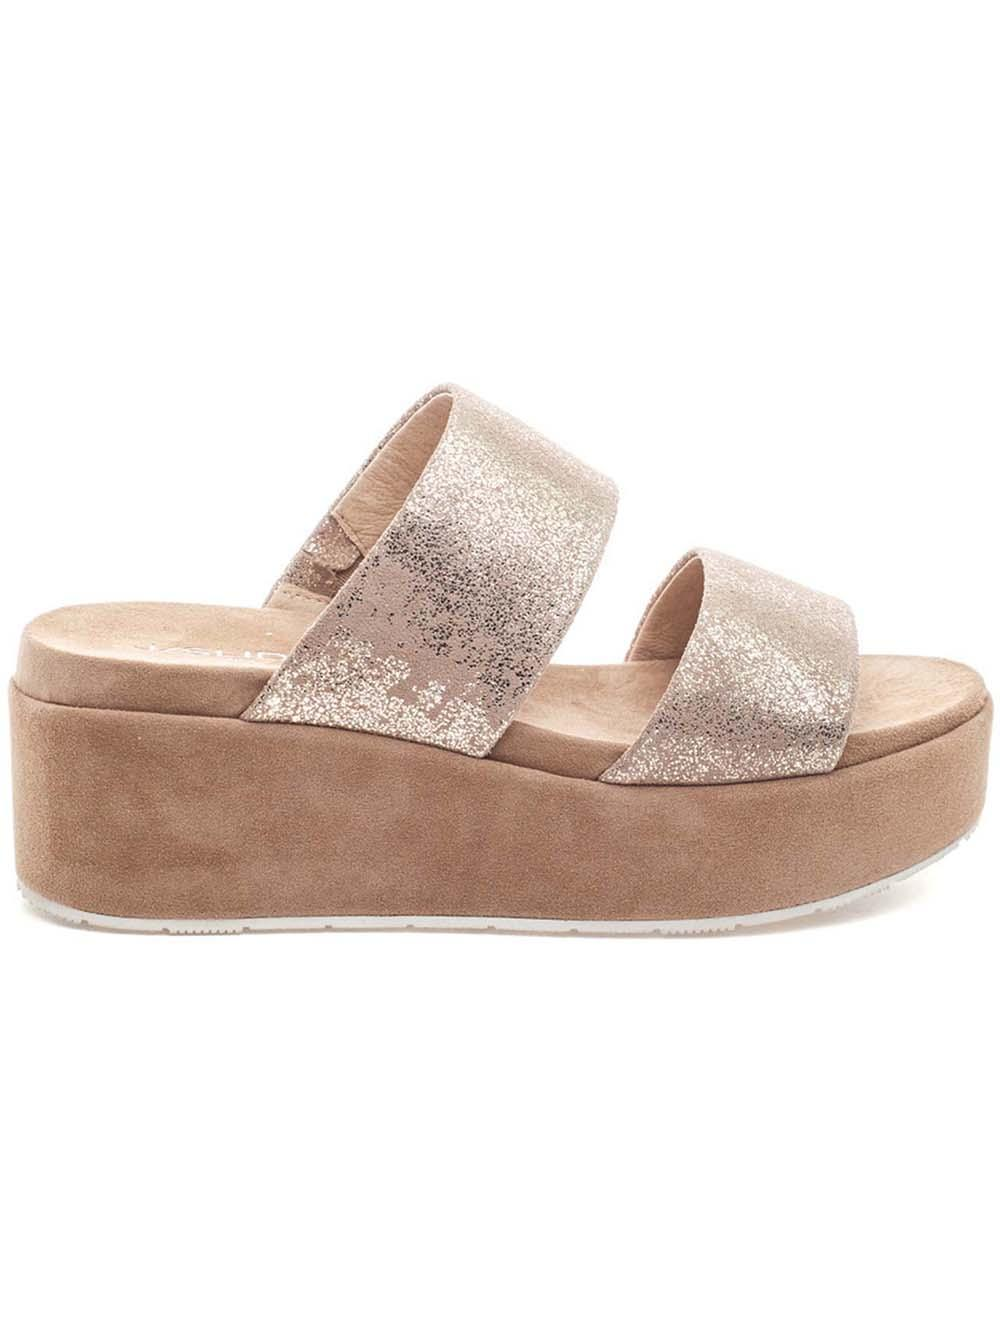 Quincy Suede Platform Sandal